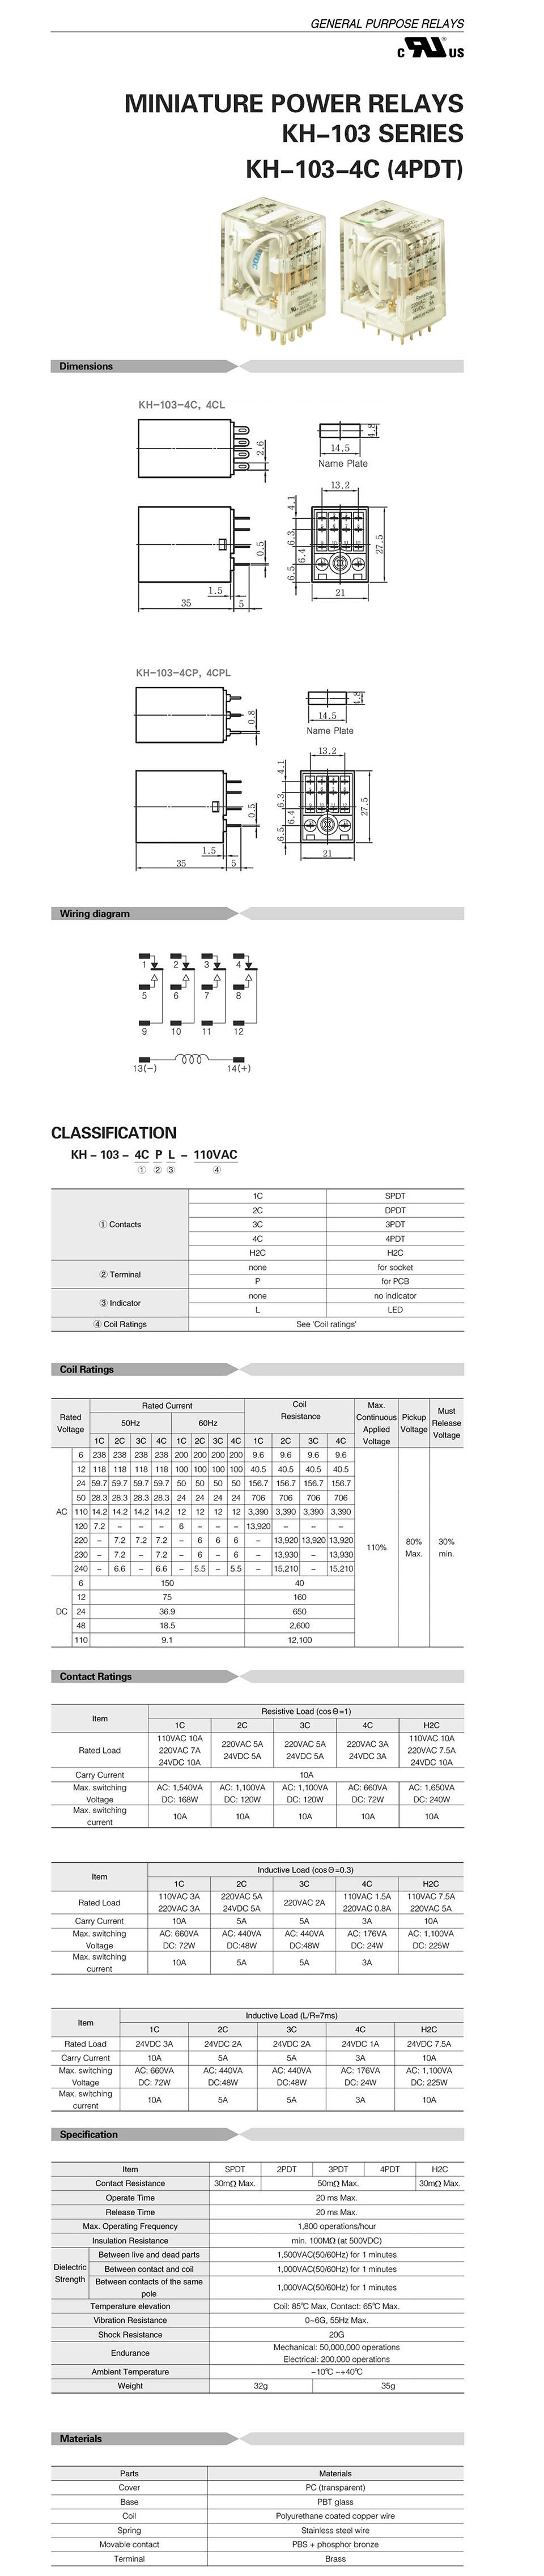 ebook Geometry